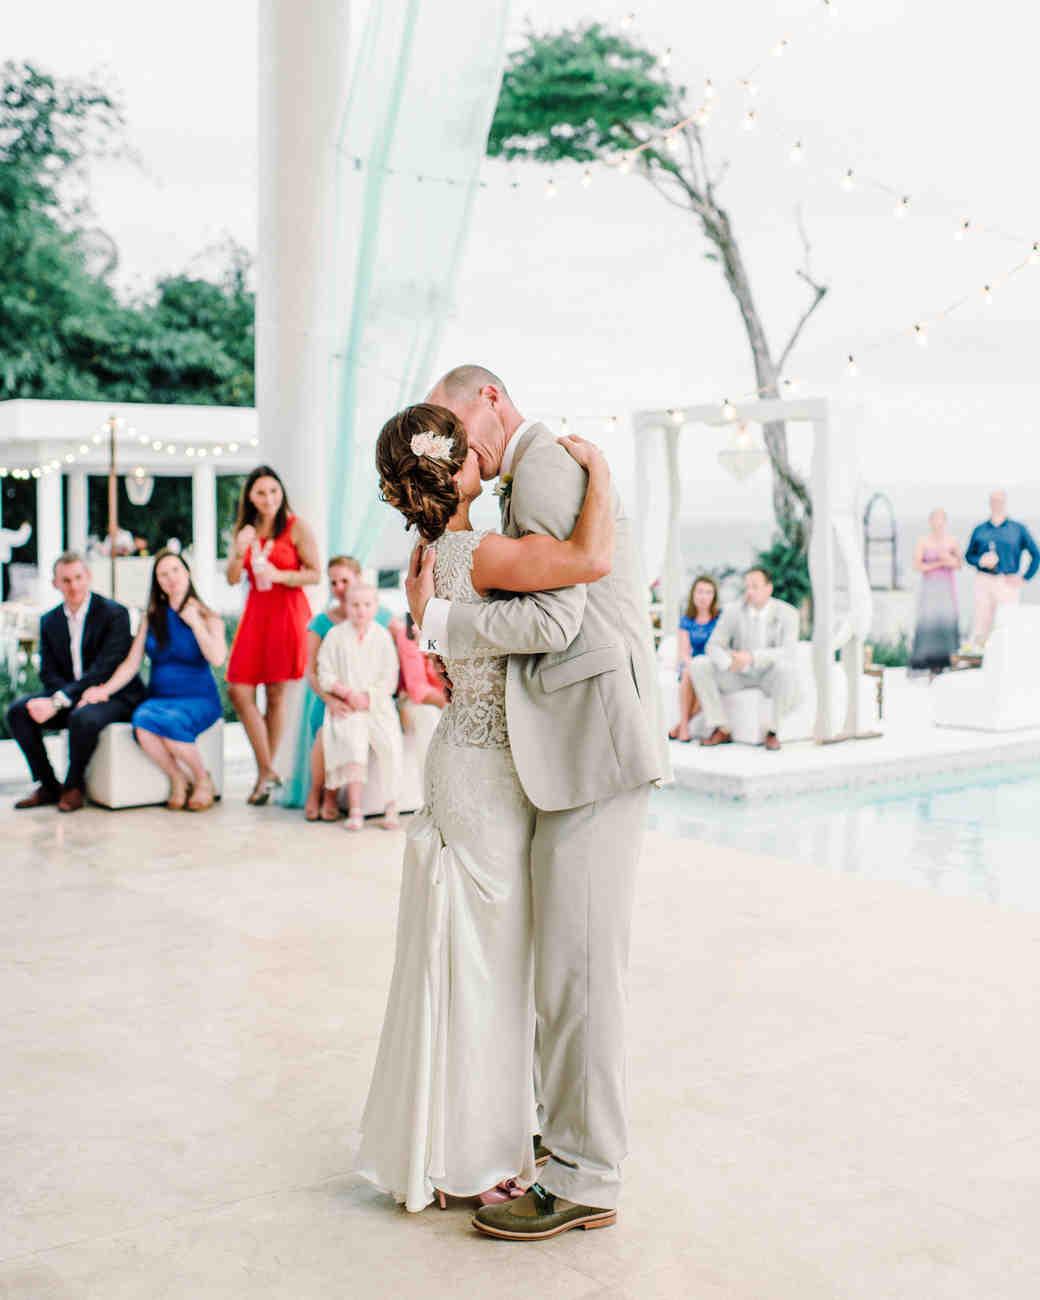 molly-nate-wedding-firstdance-195-s111479-0814.jpg